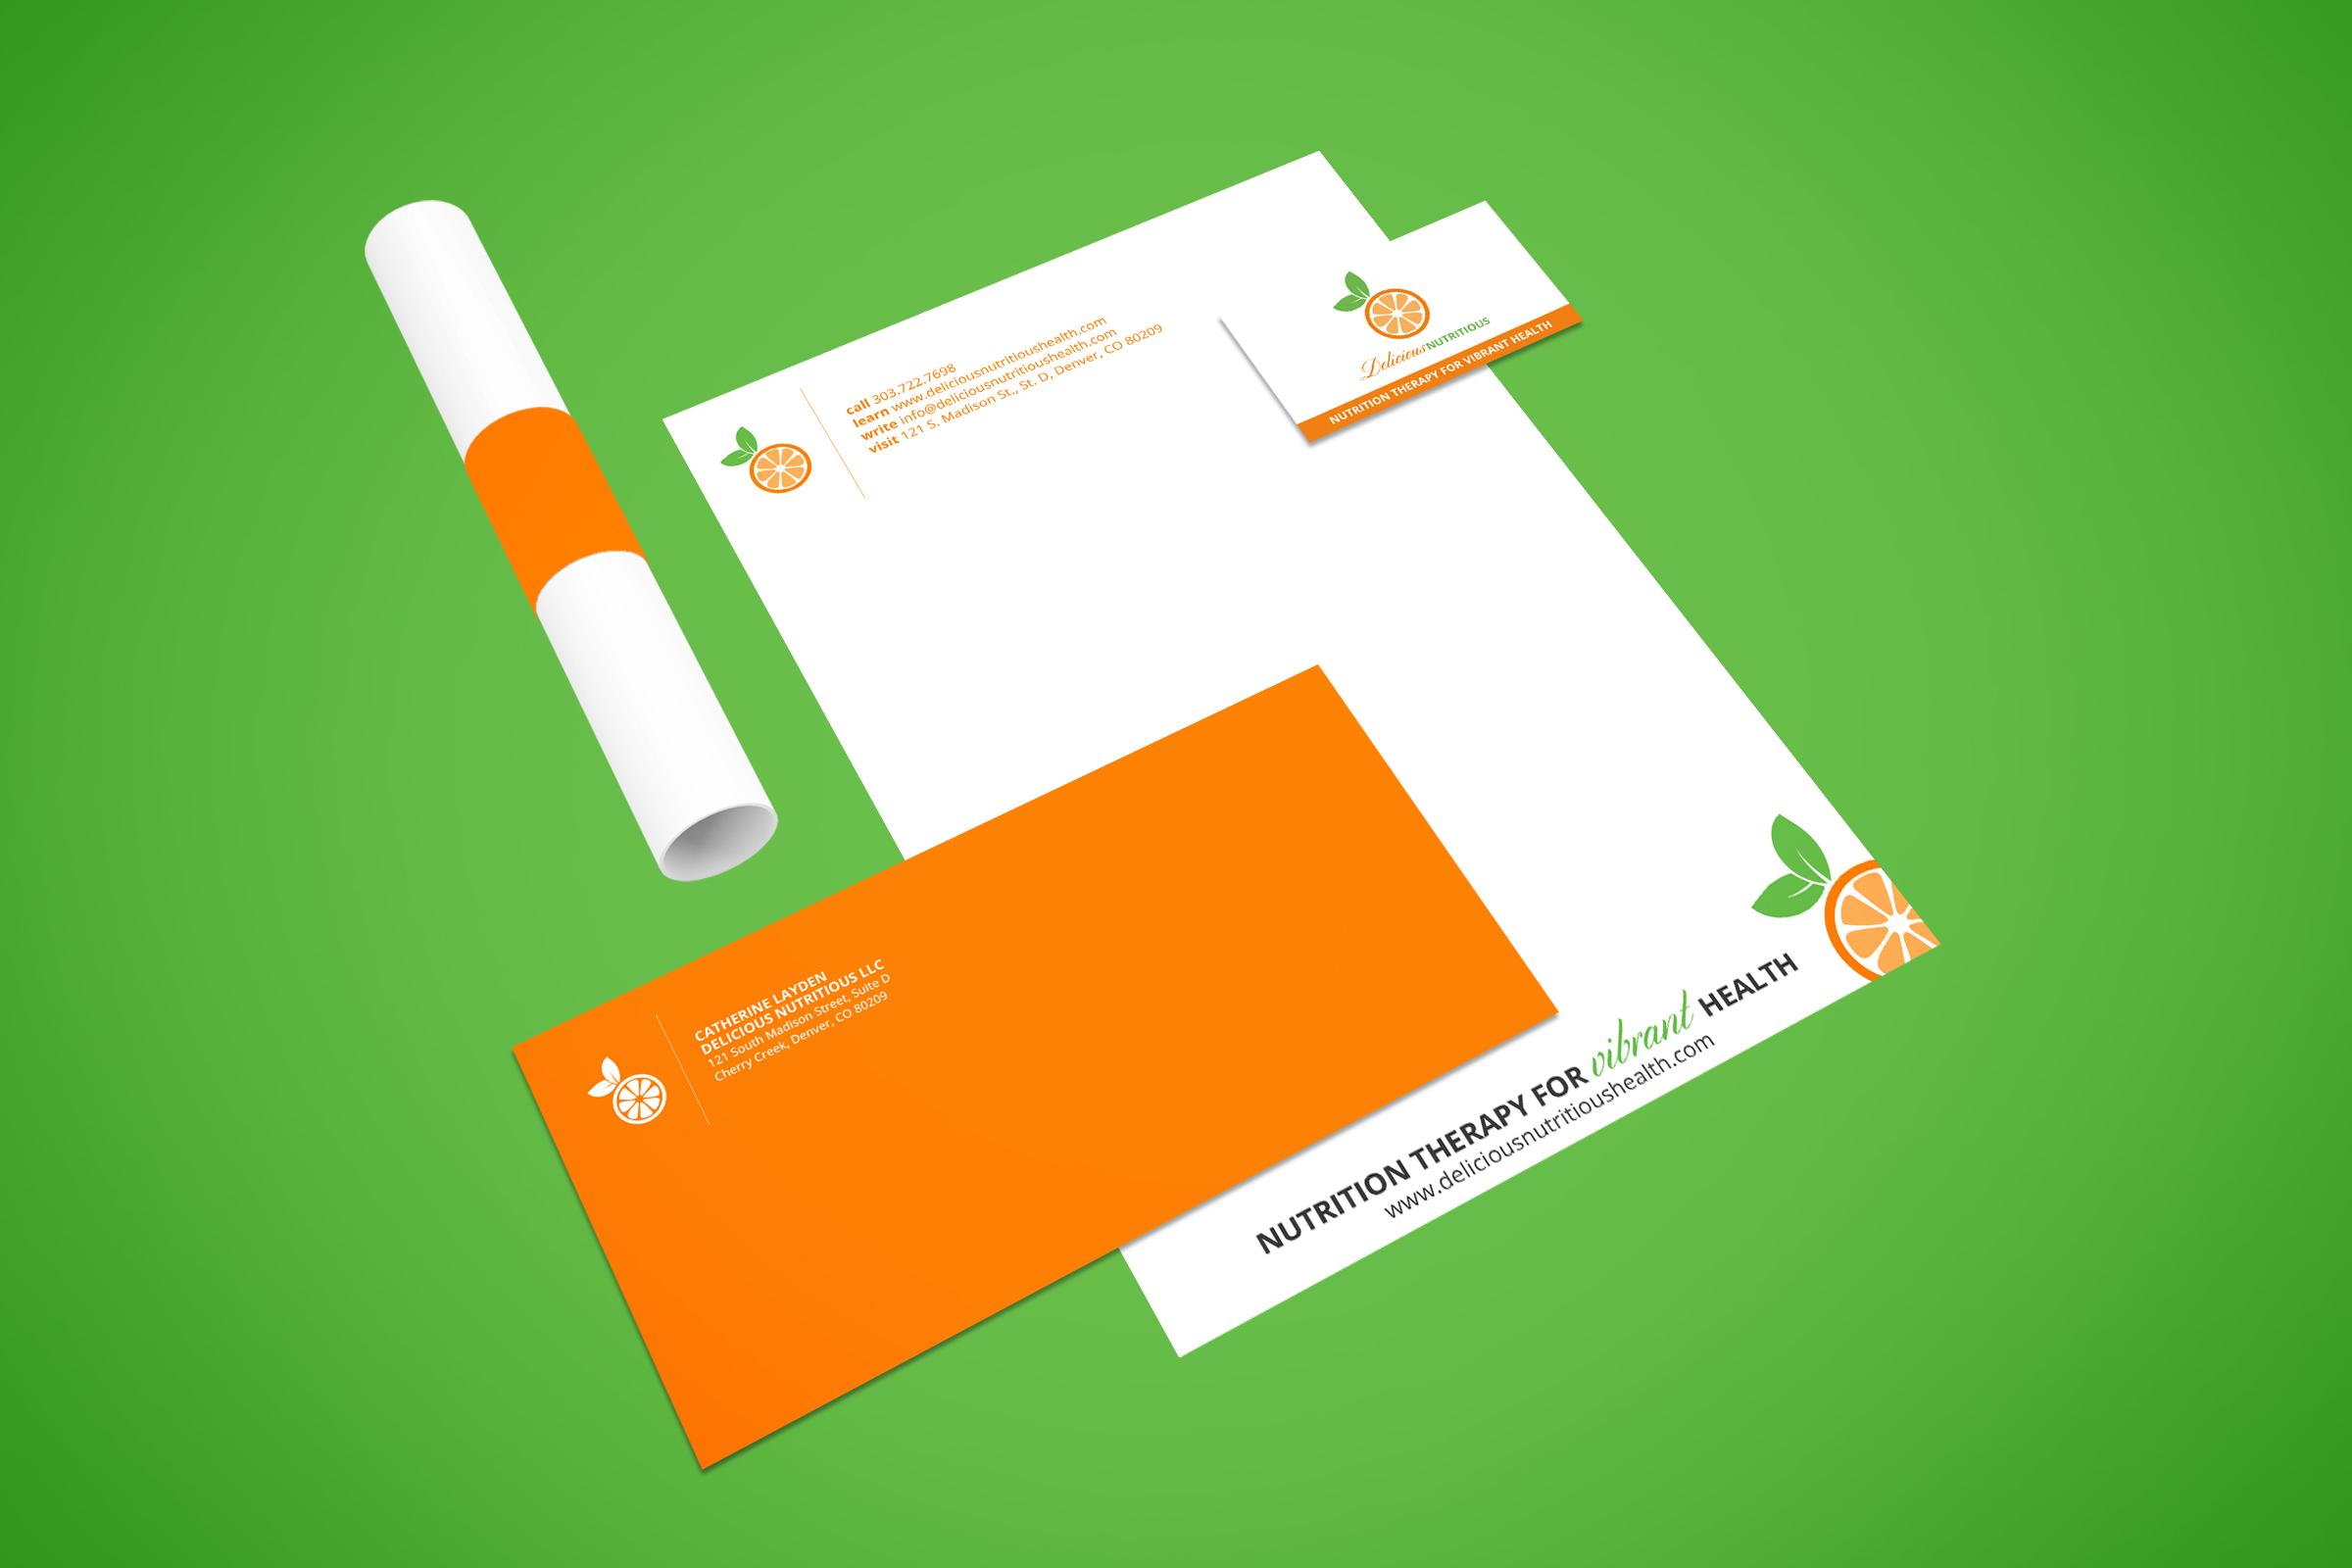 hearthfire-creative-logo-brand-identity-designer-denver-colorado-delicious-nutritious.jpg